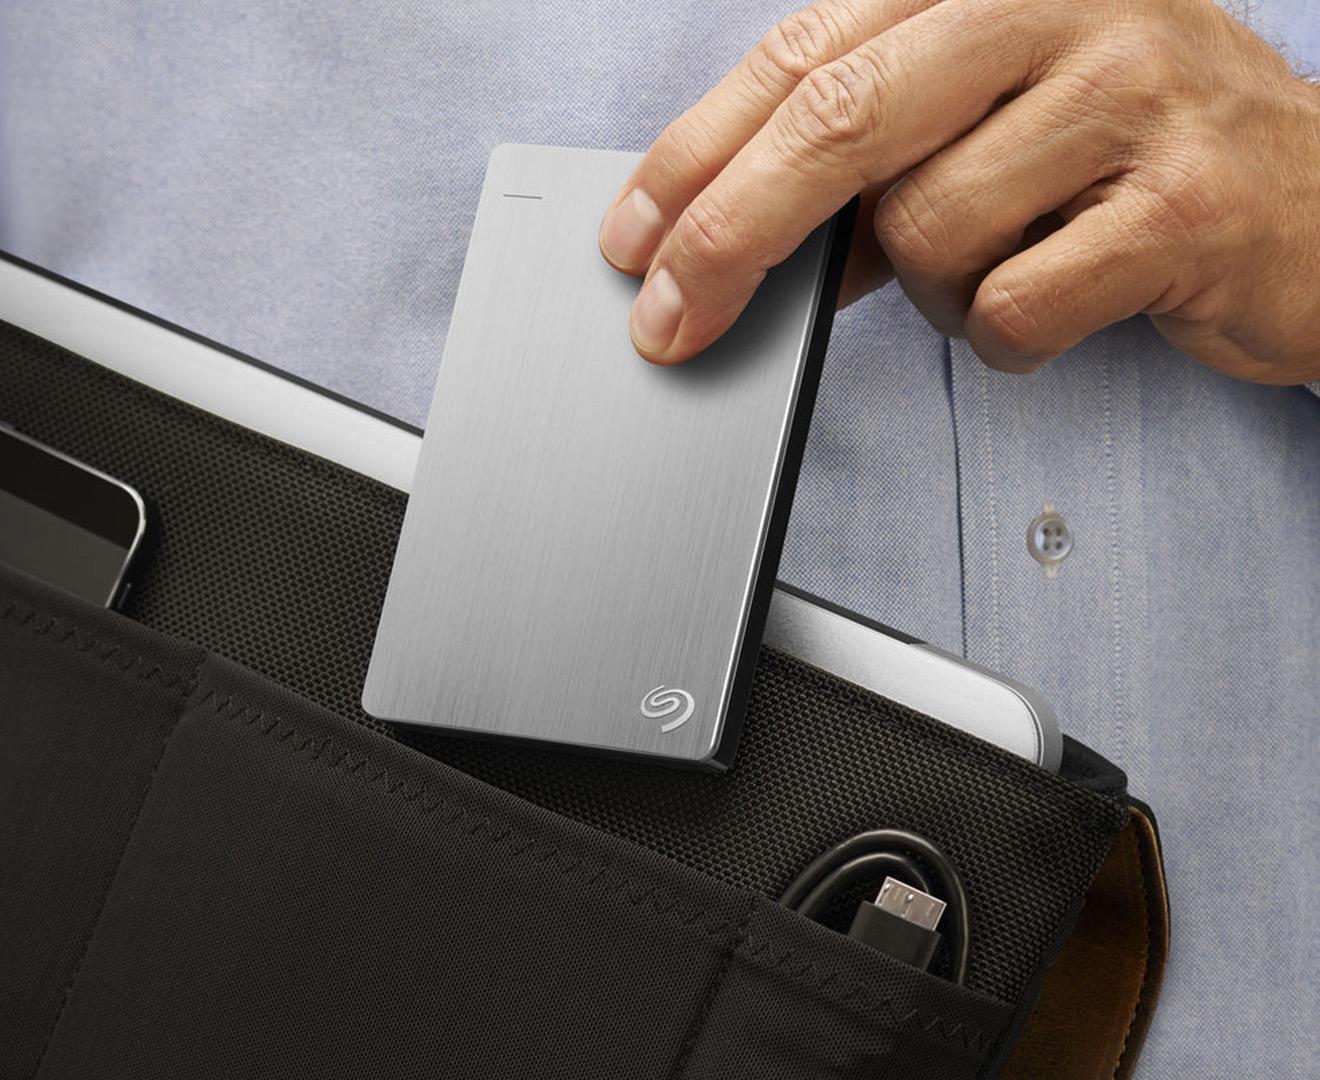 Backup photos from ipad to external hard drive